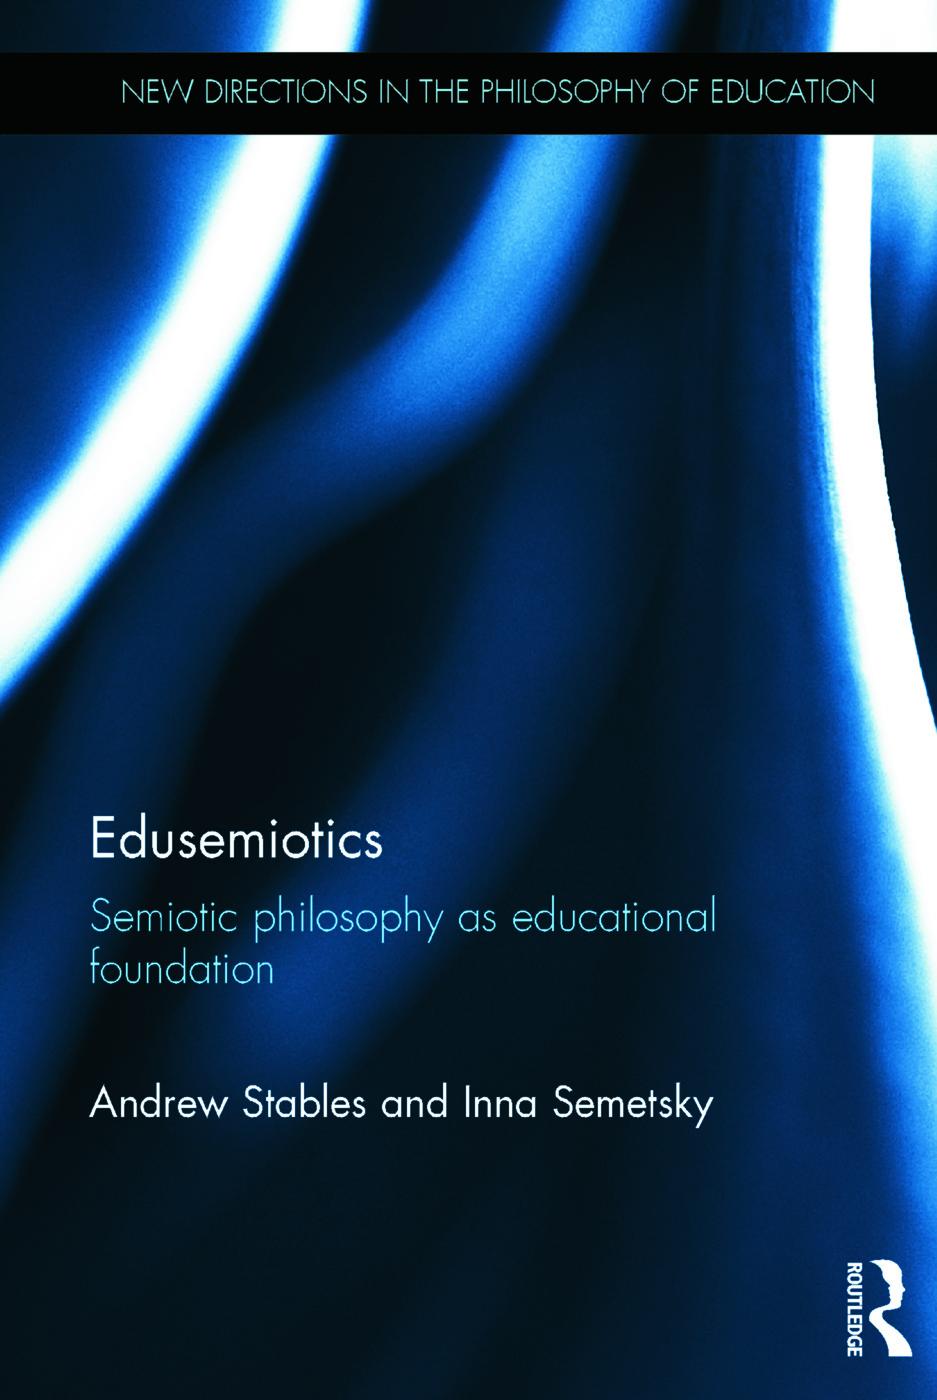 Edusemiotics: Semiotic philosophy as educational foundation book cover